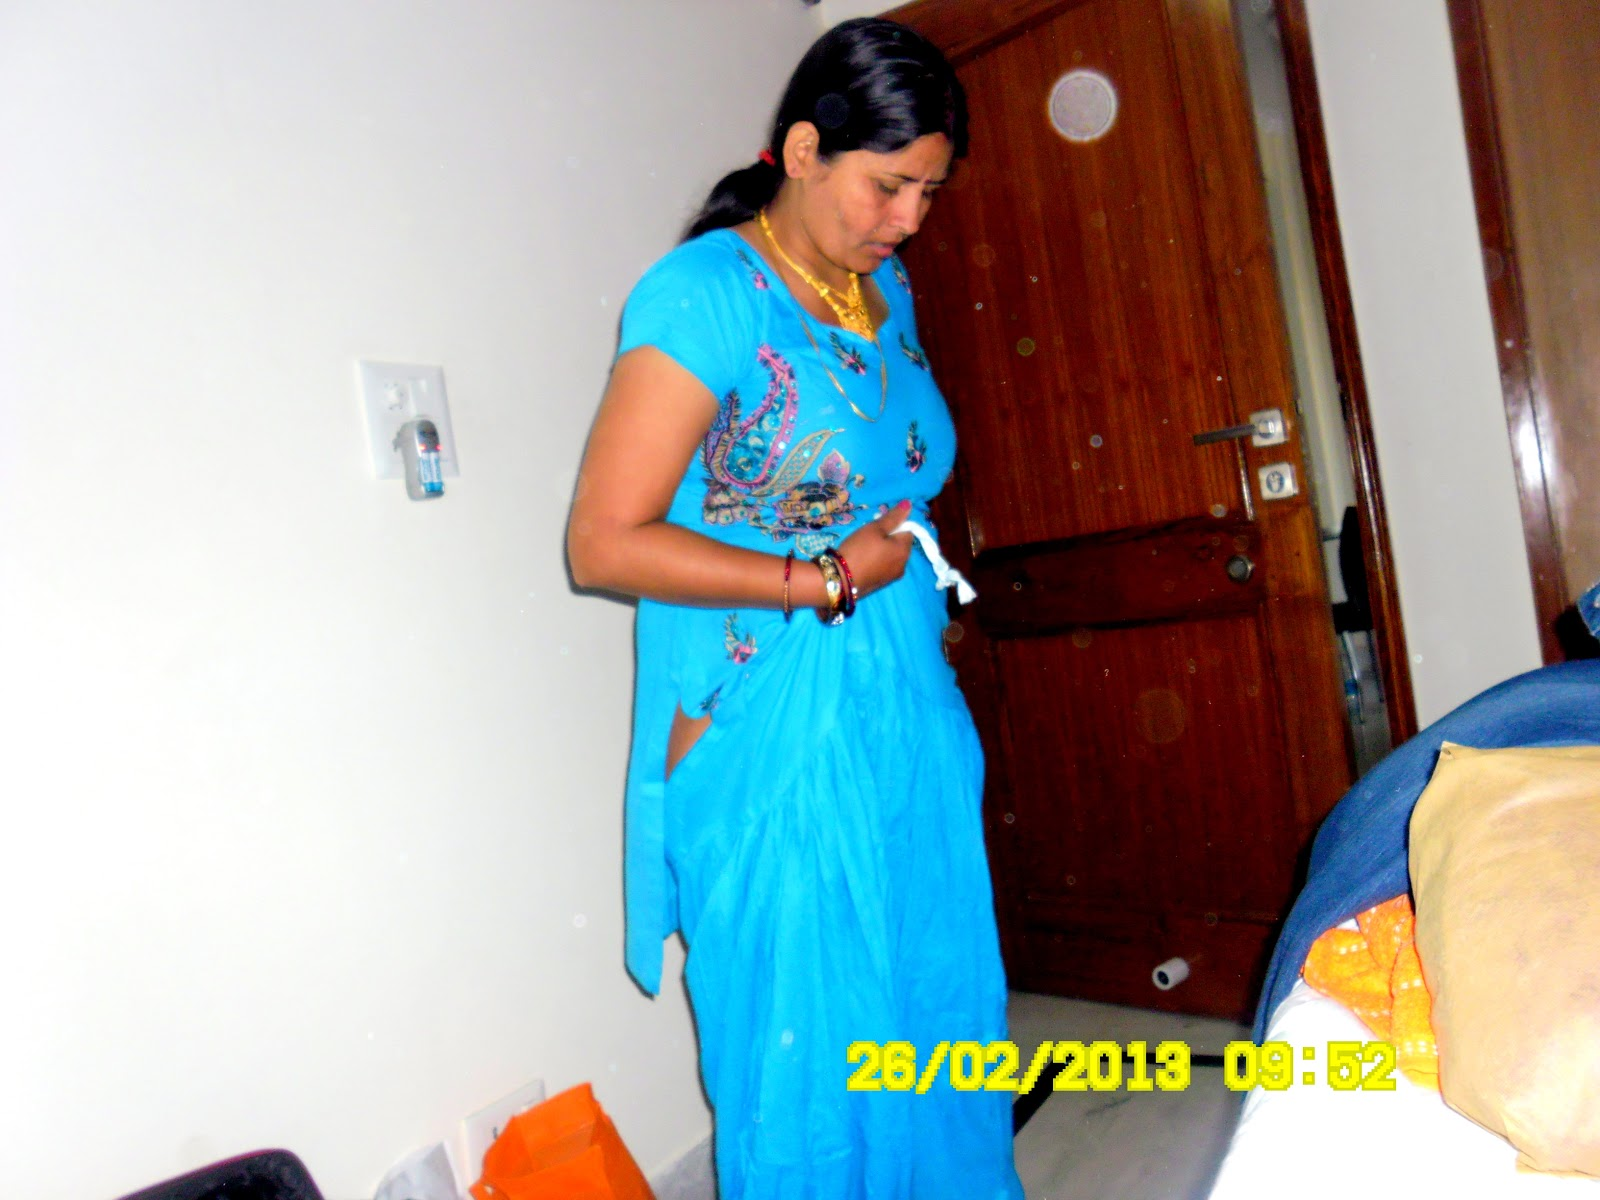 desi dress change photo - photo #10